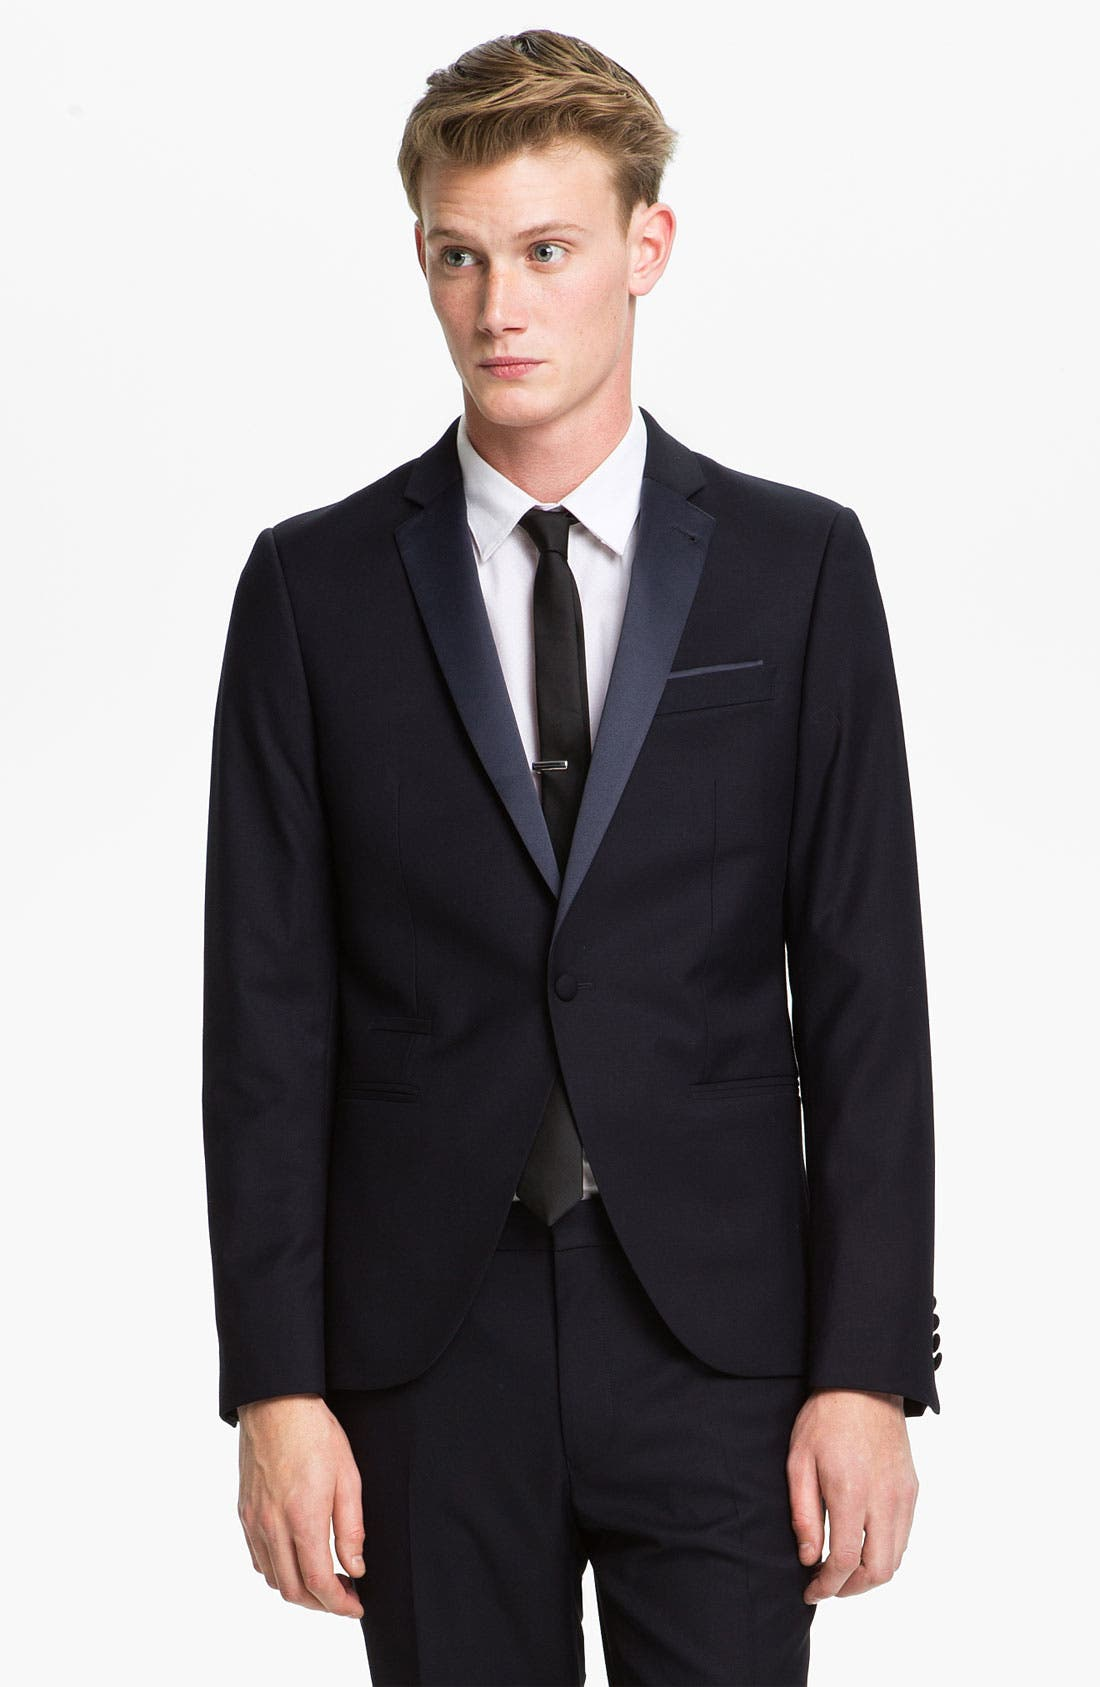 TOPMAN, Skinny Fit Single-Button Tuxedo Jacket, Main thumbnail 1, color, 410